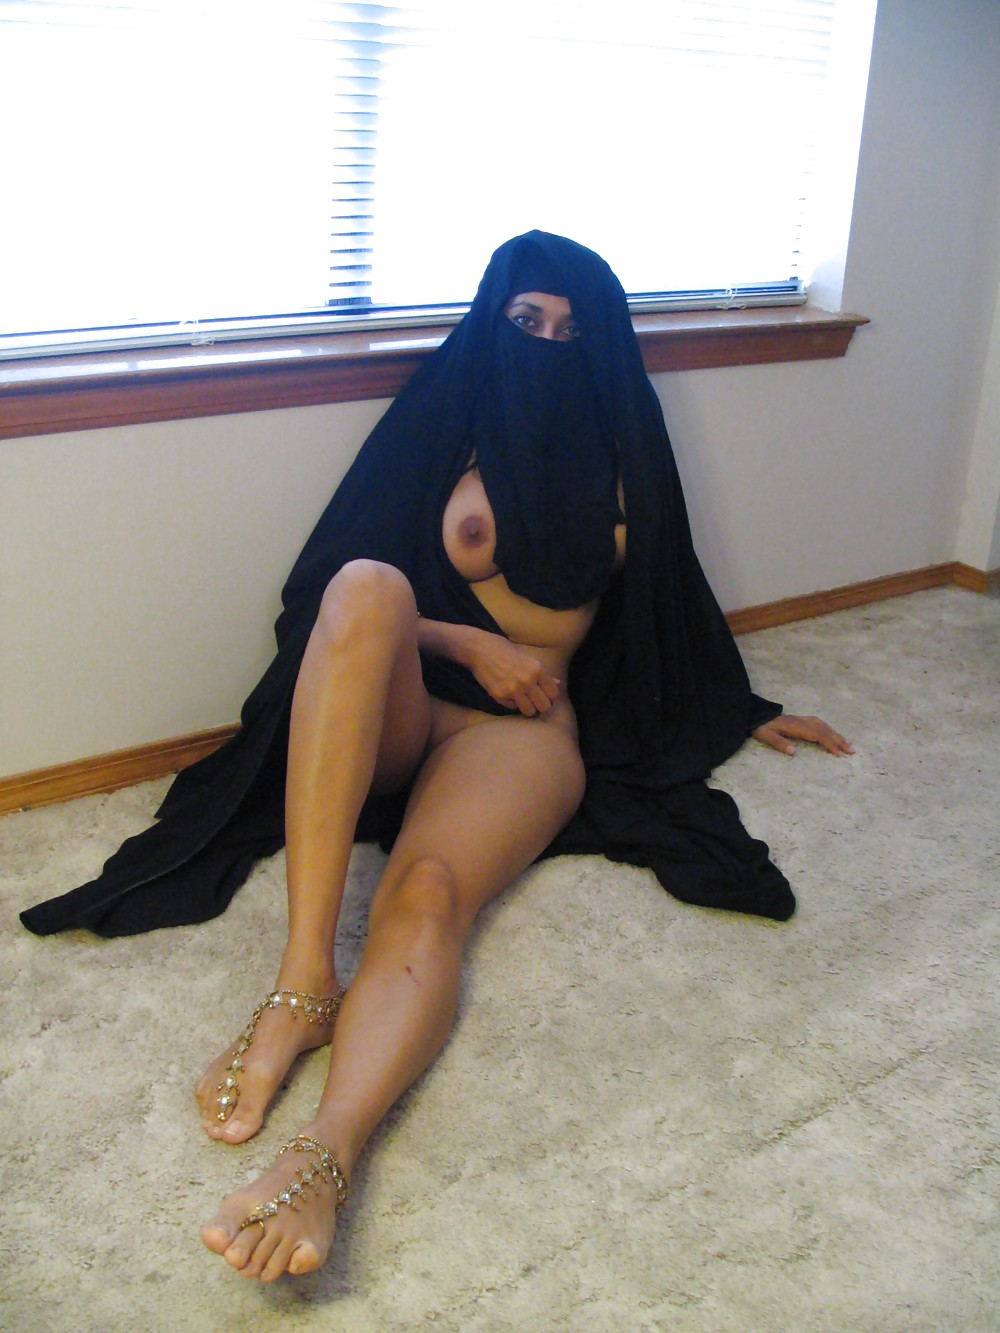 Burka sexy woman, moms self pics nude